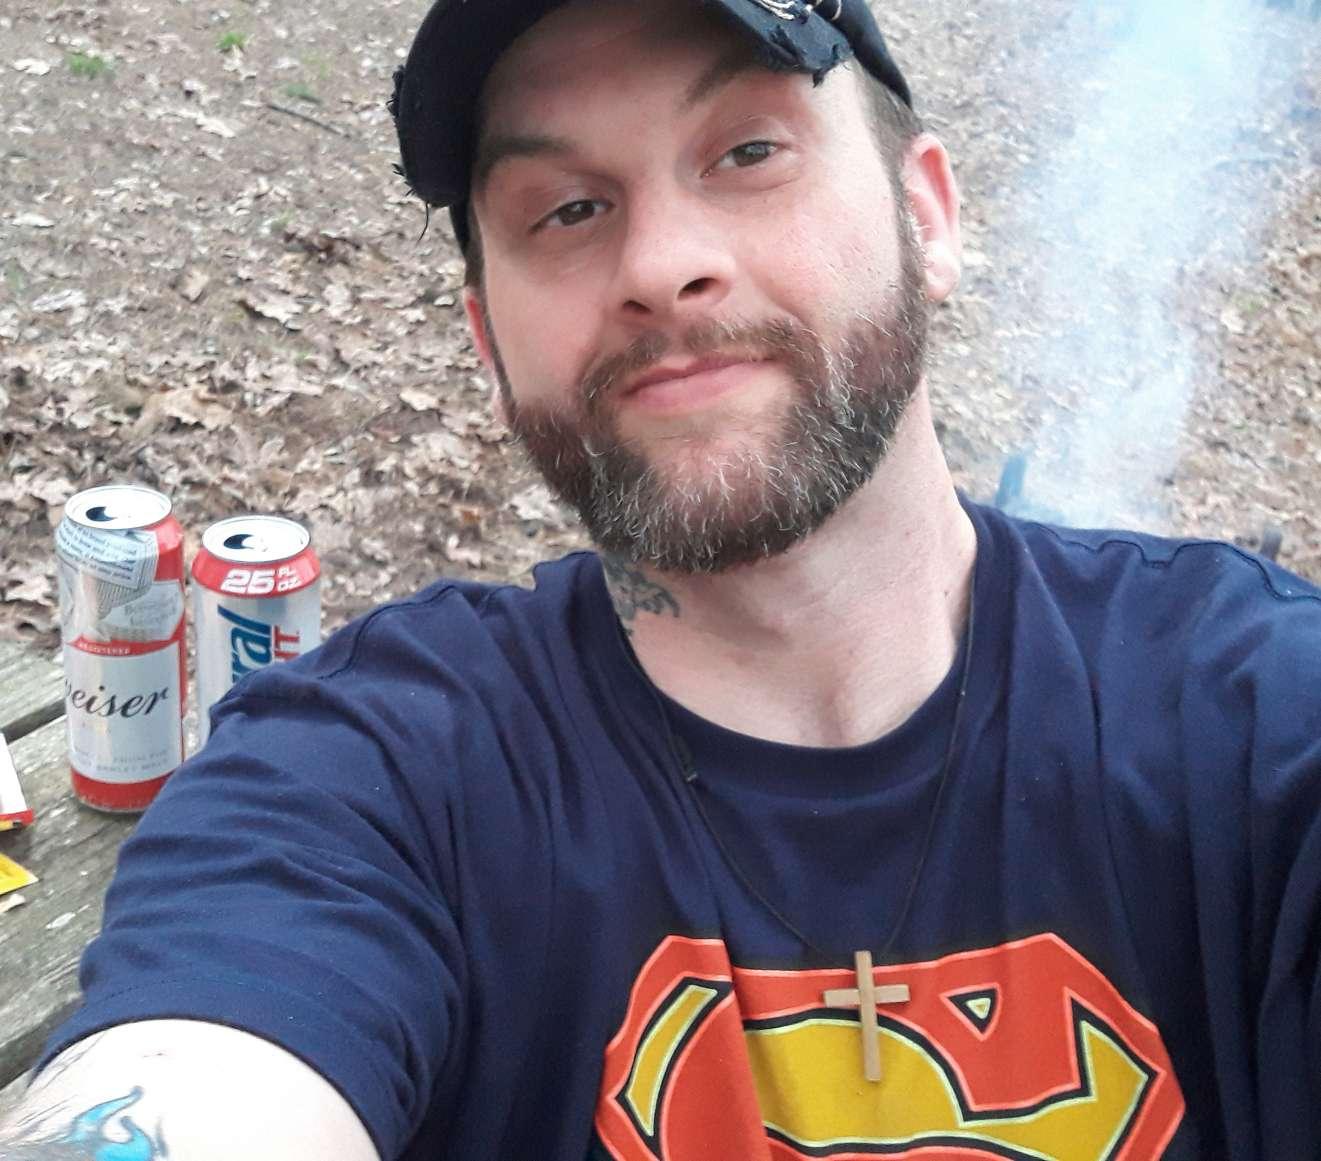 Jason malnar profile image